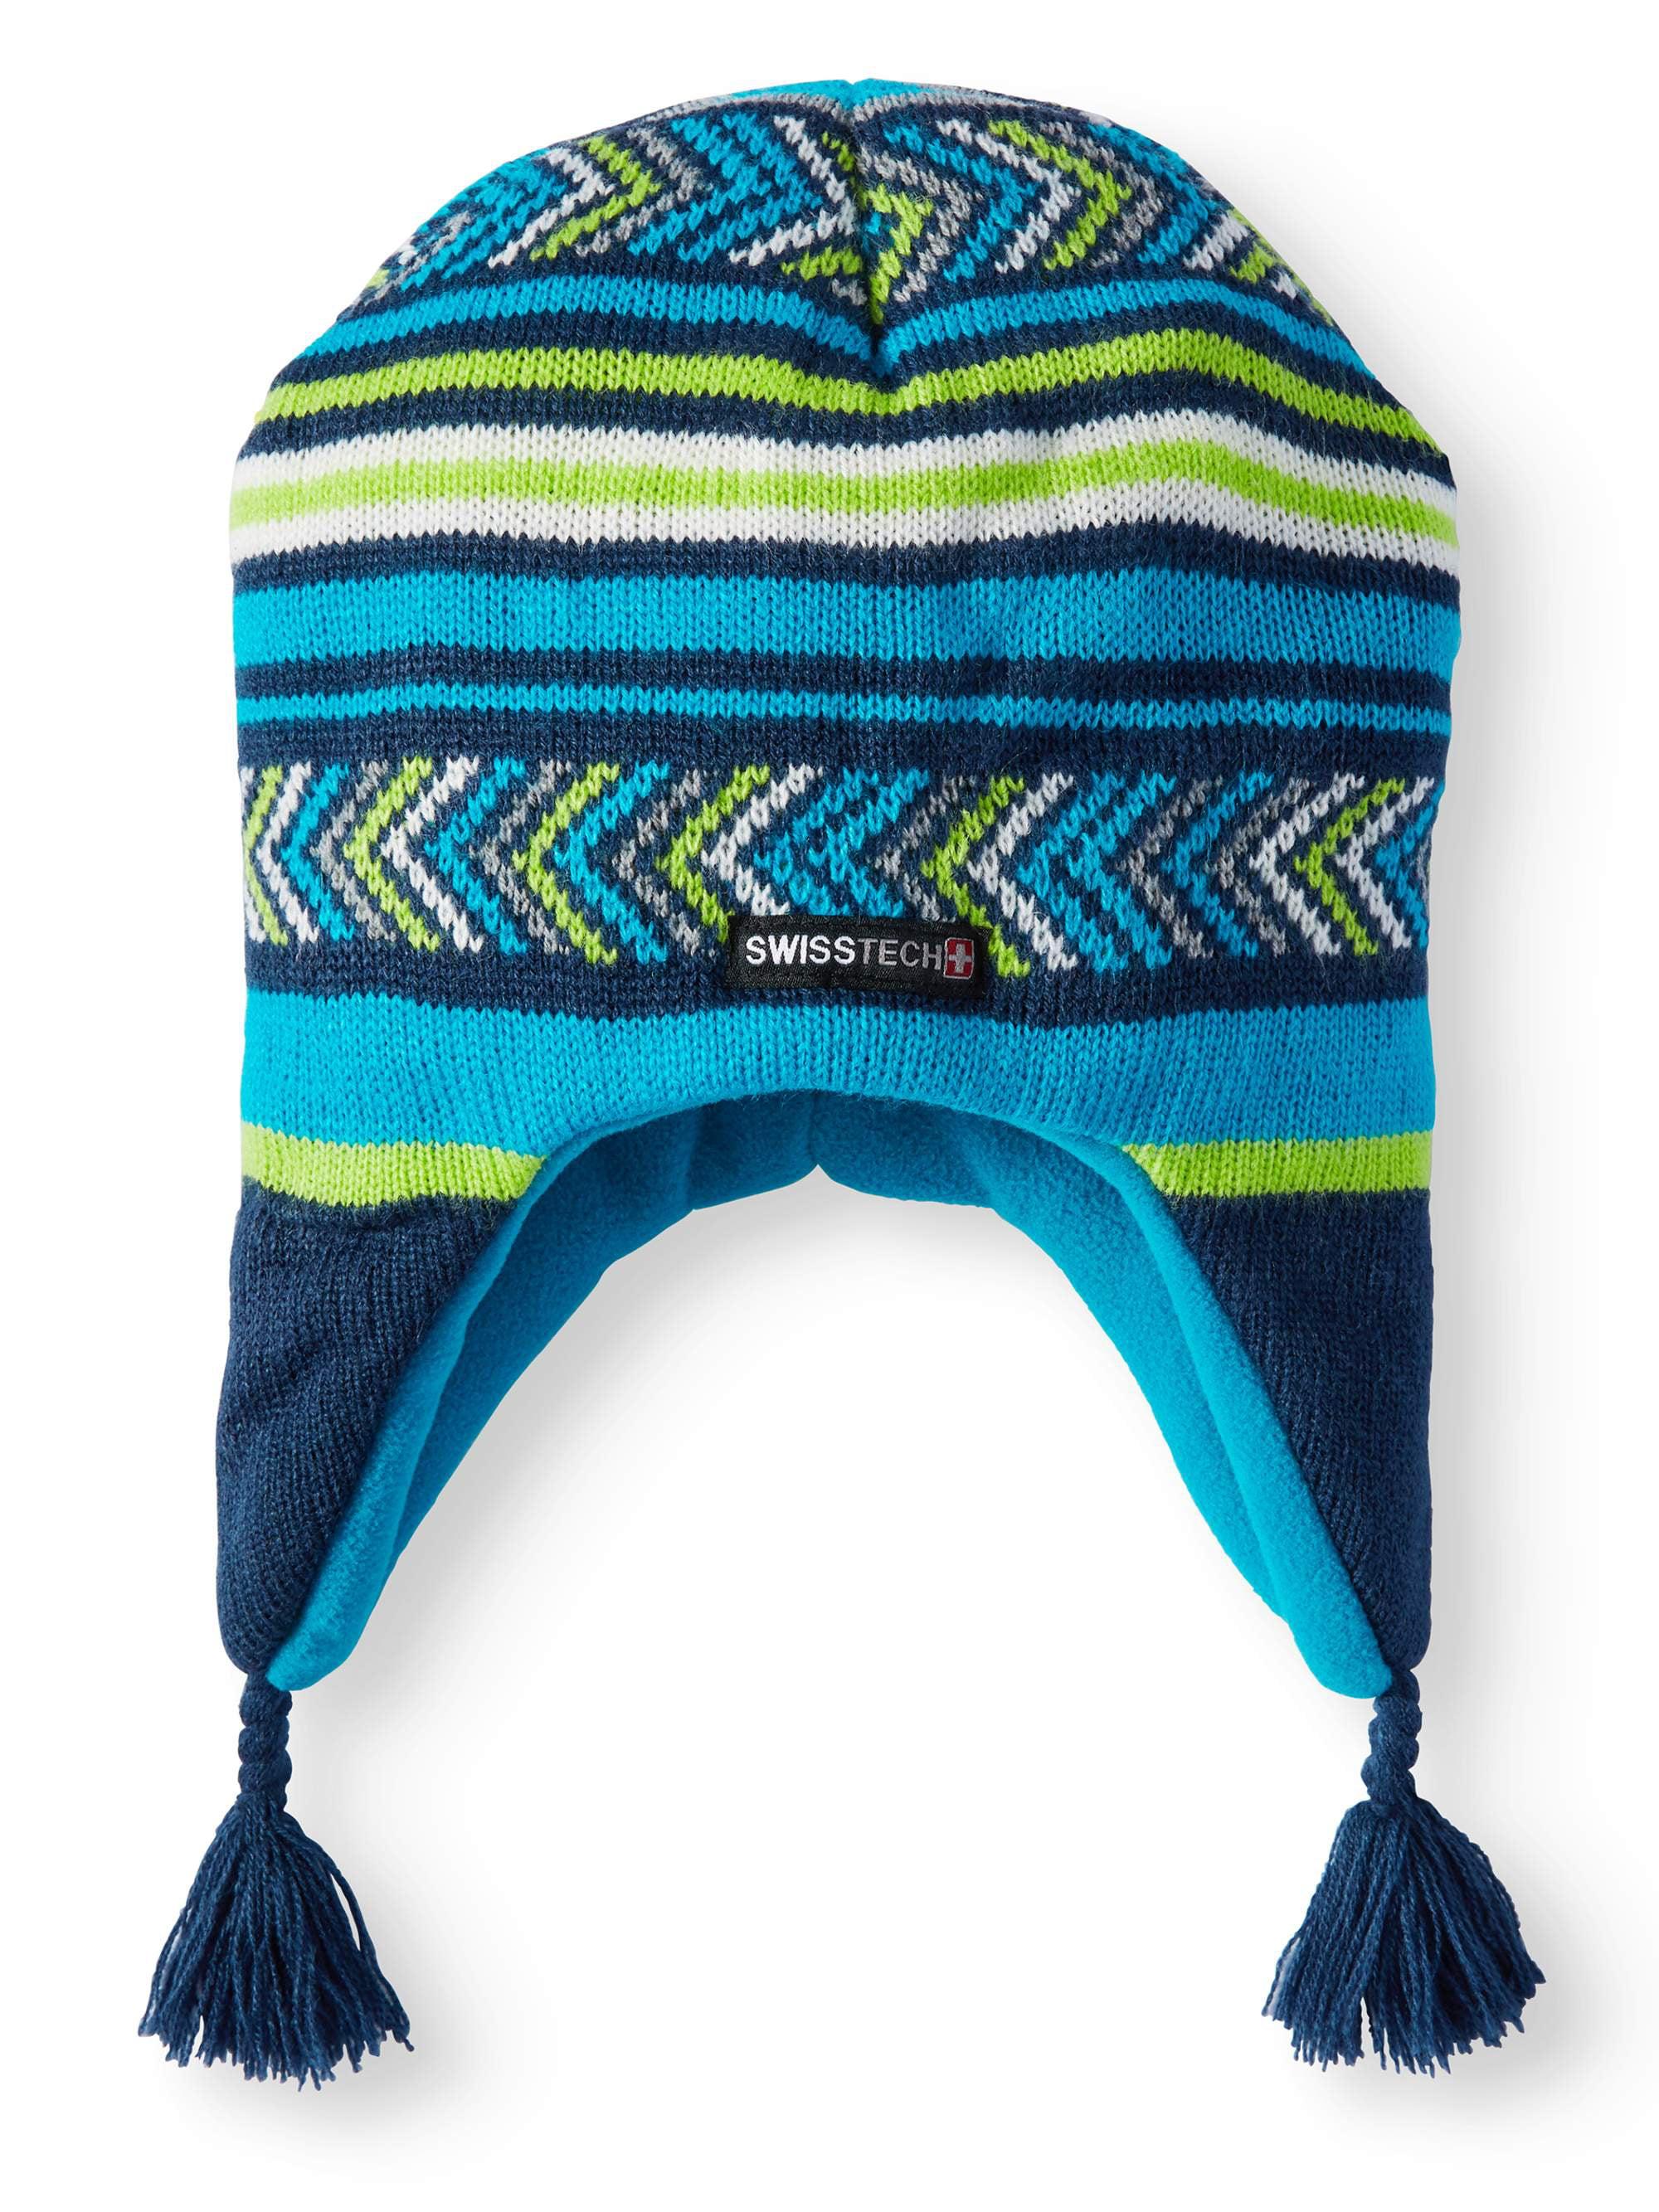 Swiss+Tech Youth Girl's Fairisle Peruvian Knit Cap With Thinsulate M-80 Lining